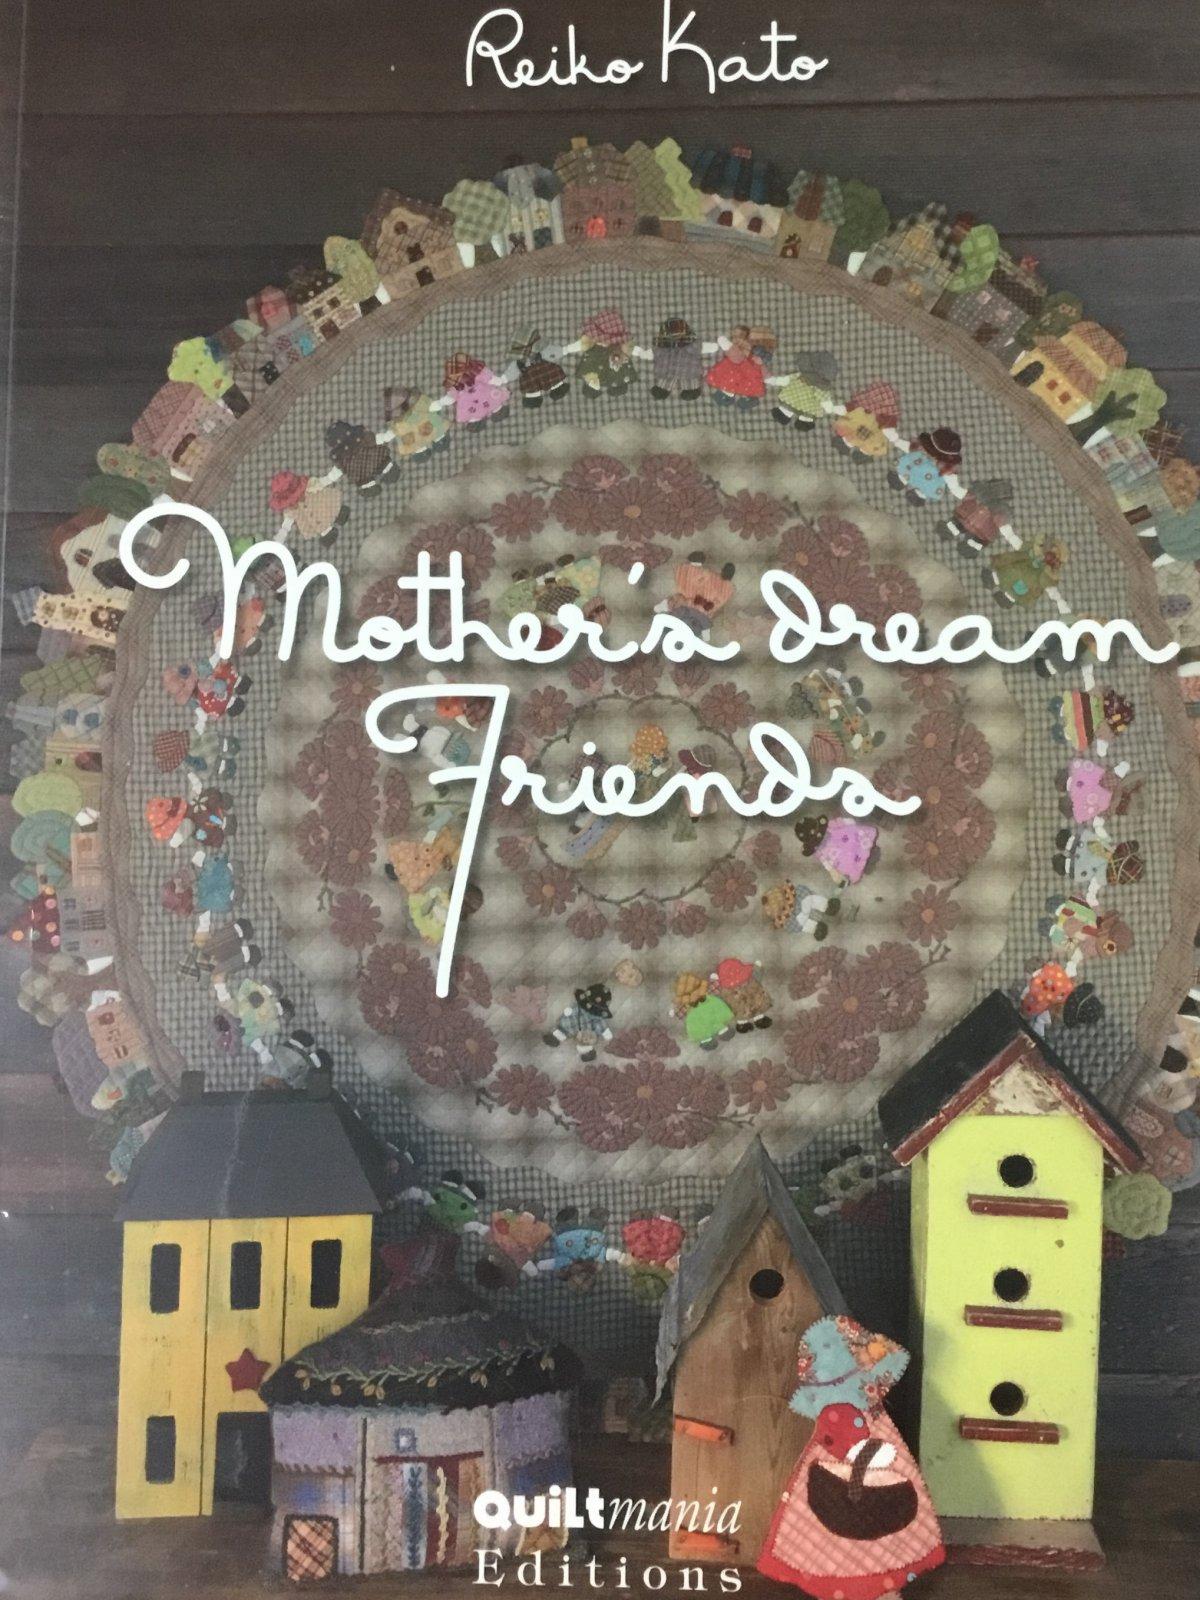 Mother's Dream Friends by Reiko Kato